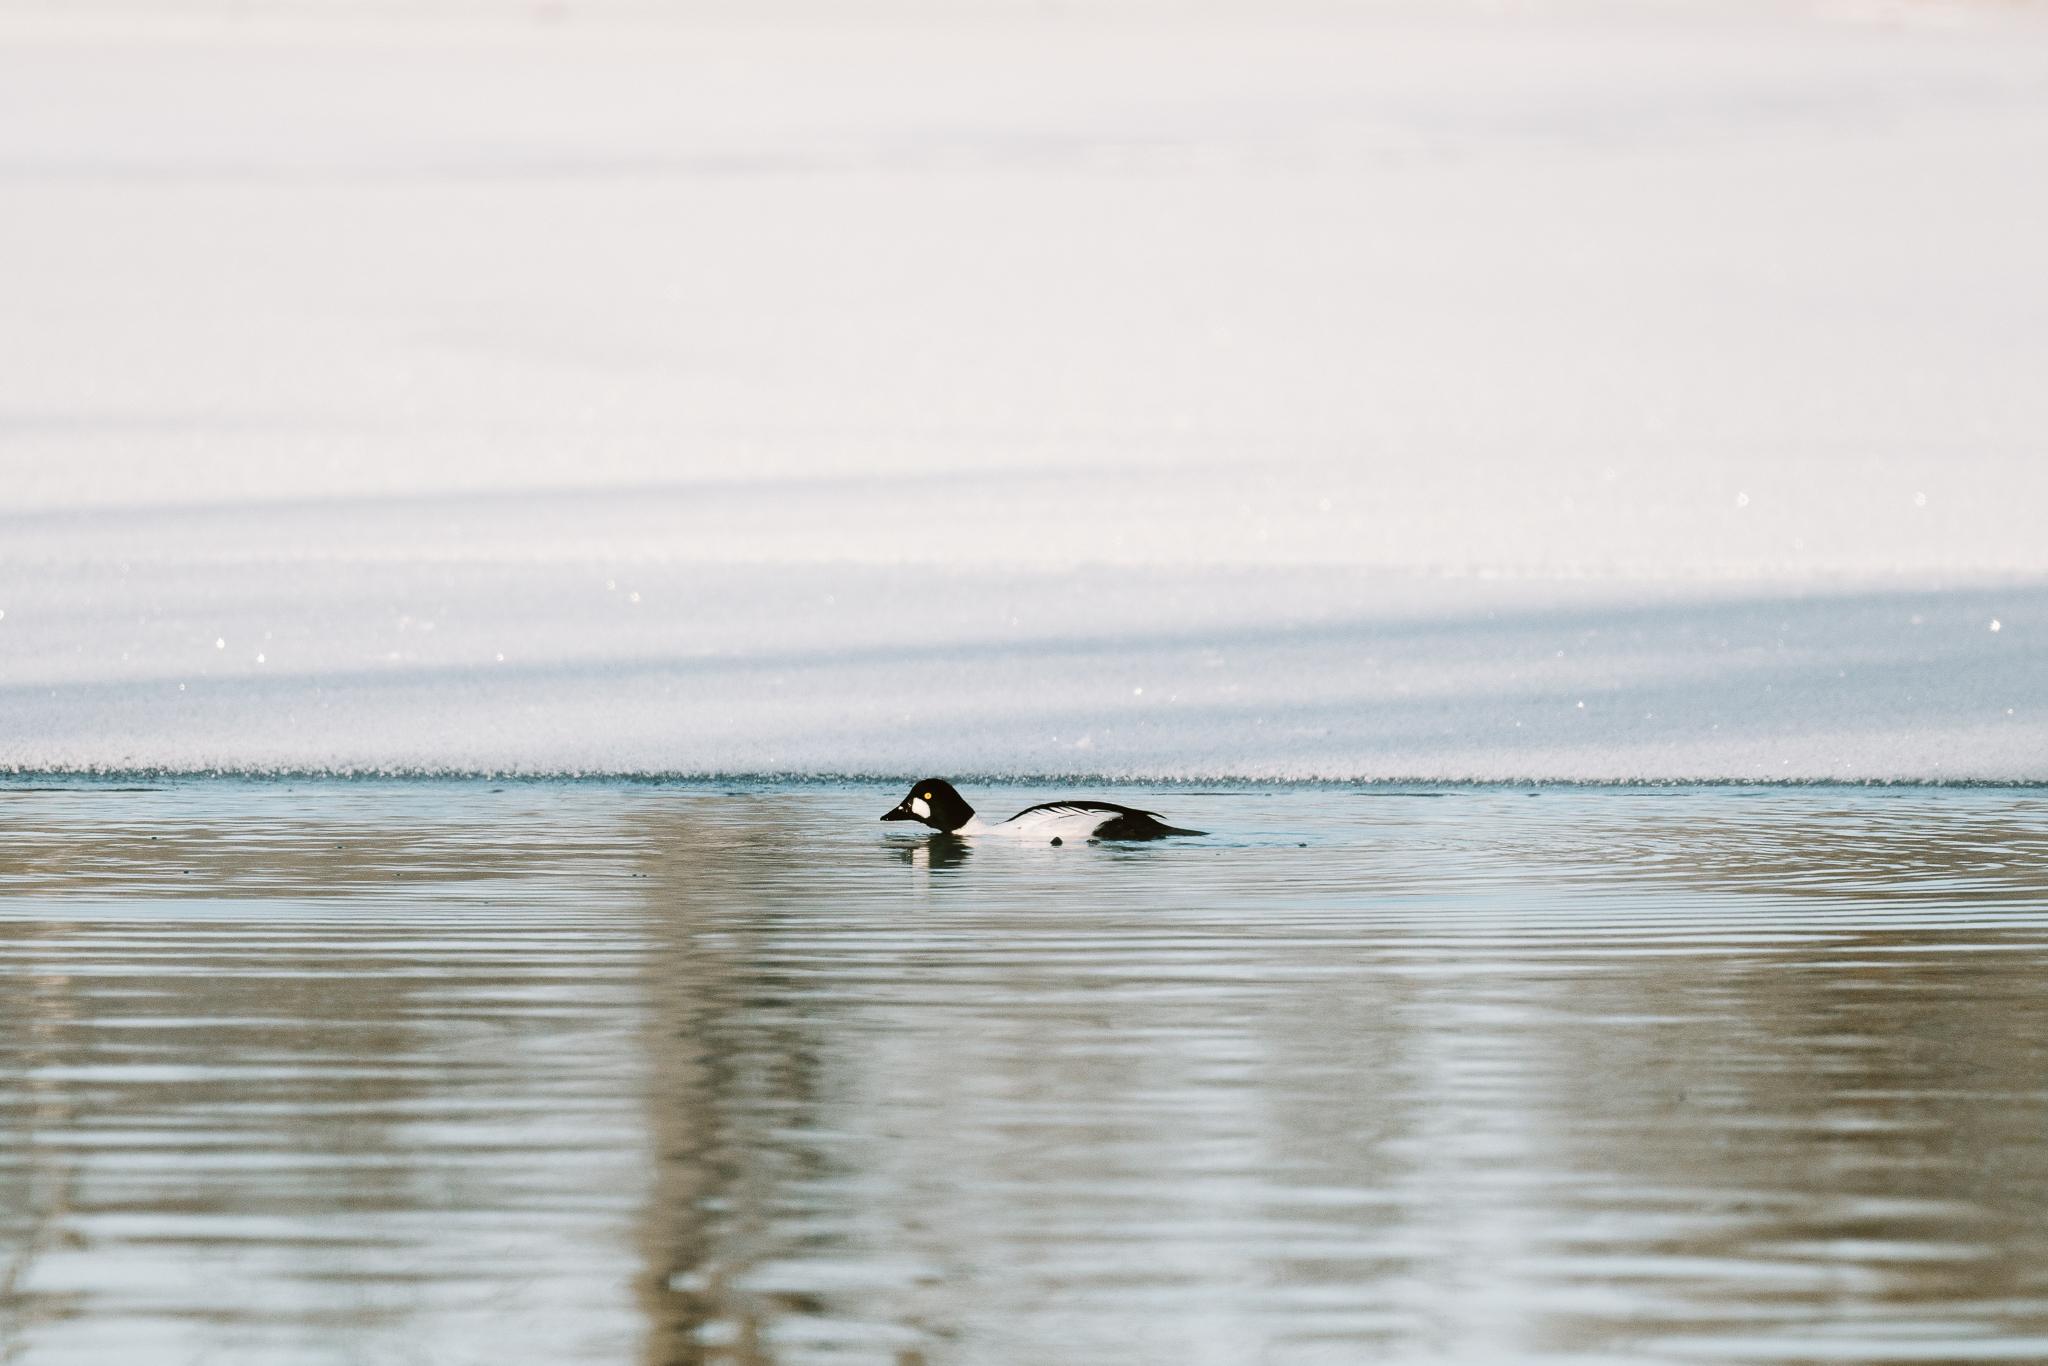 GoldenEye Duck at Colvill Park in Red Wing, Minnesota